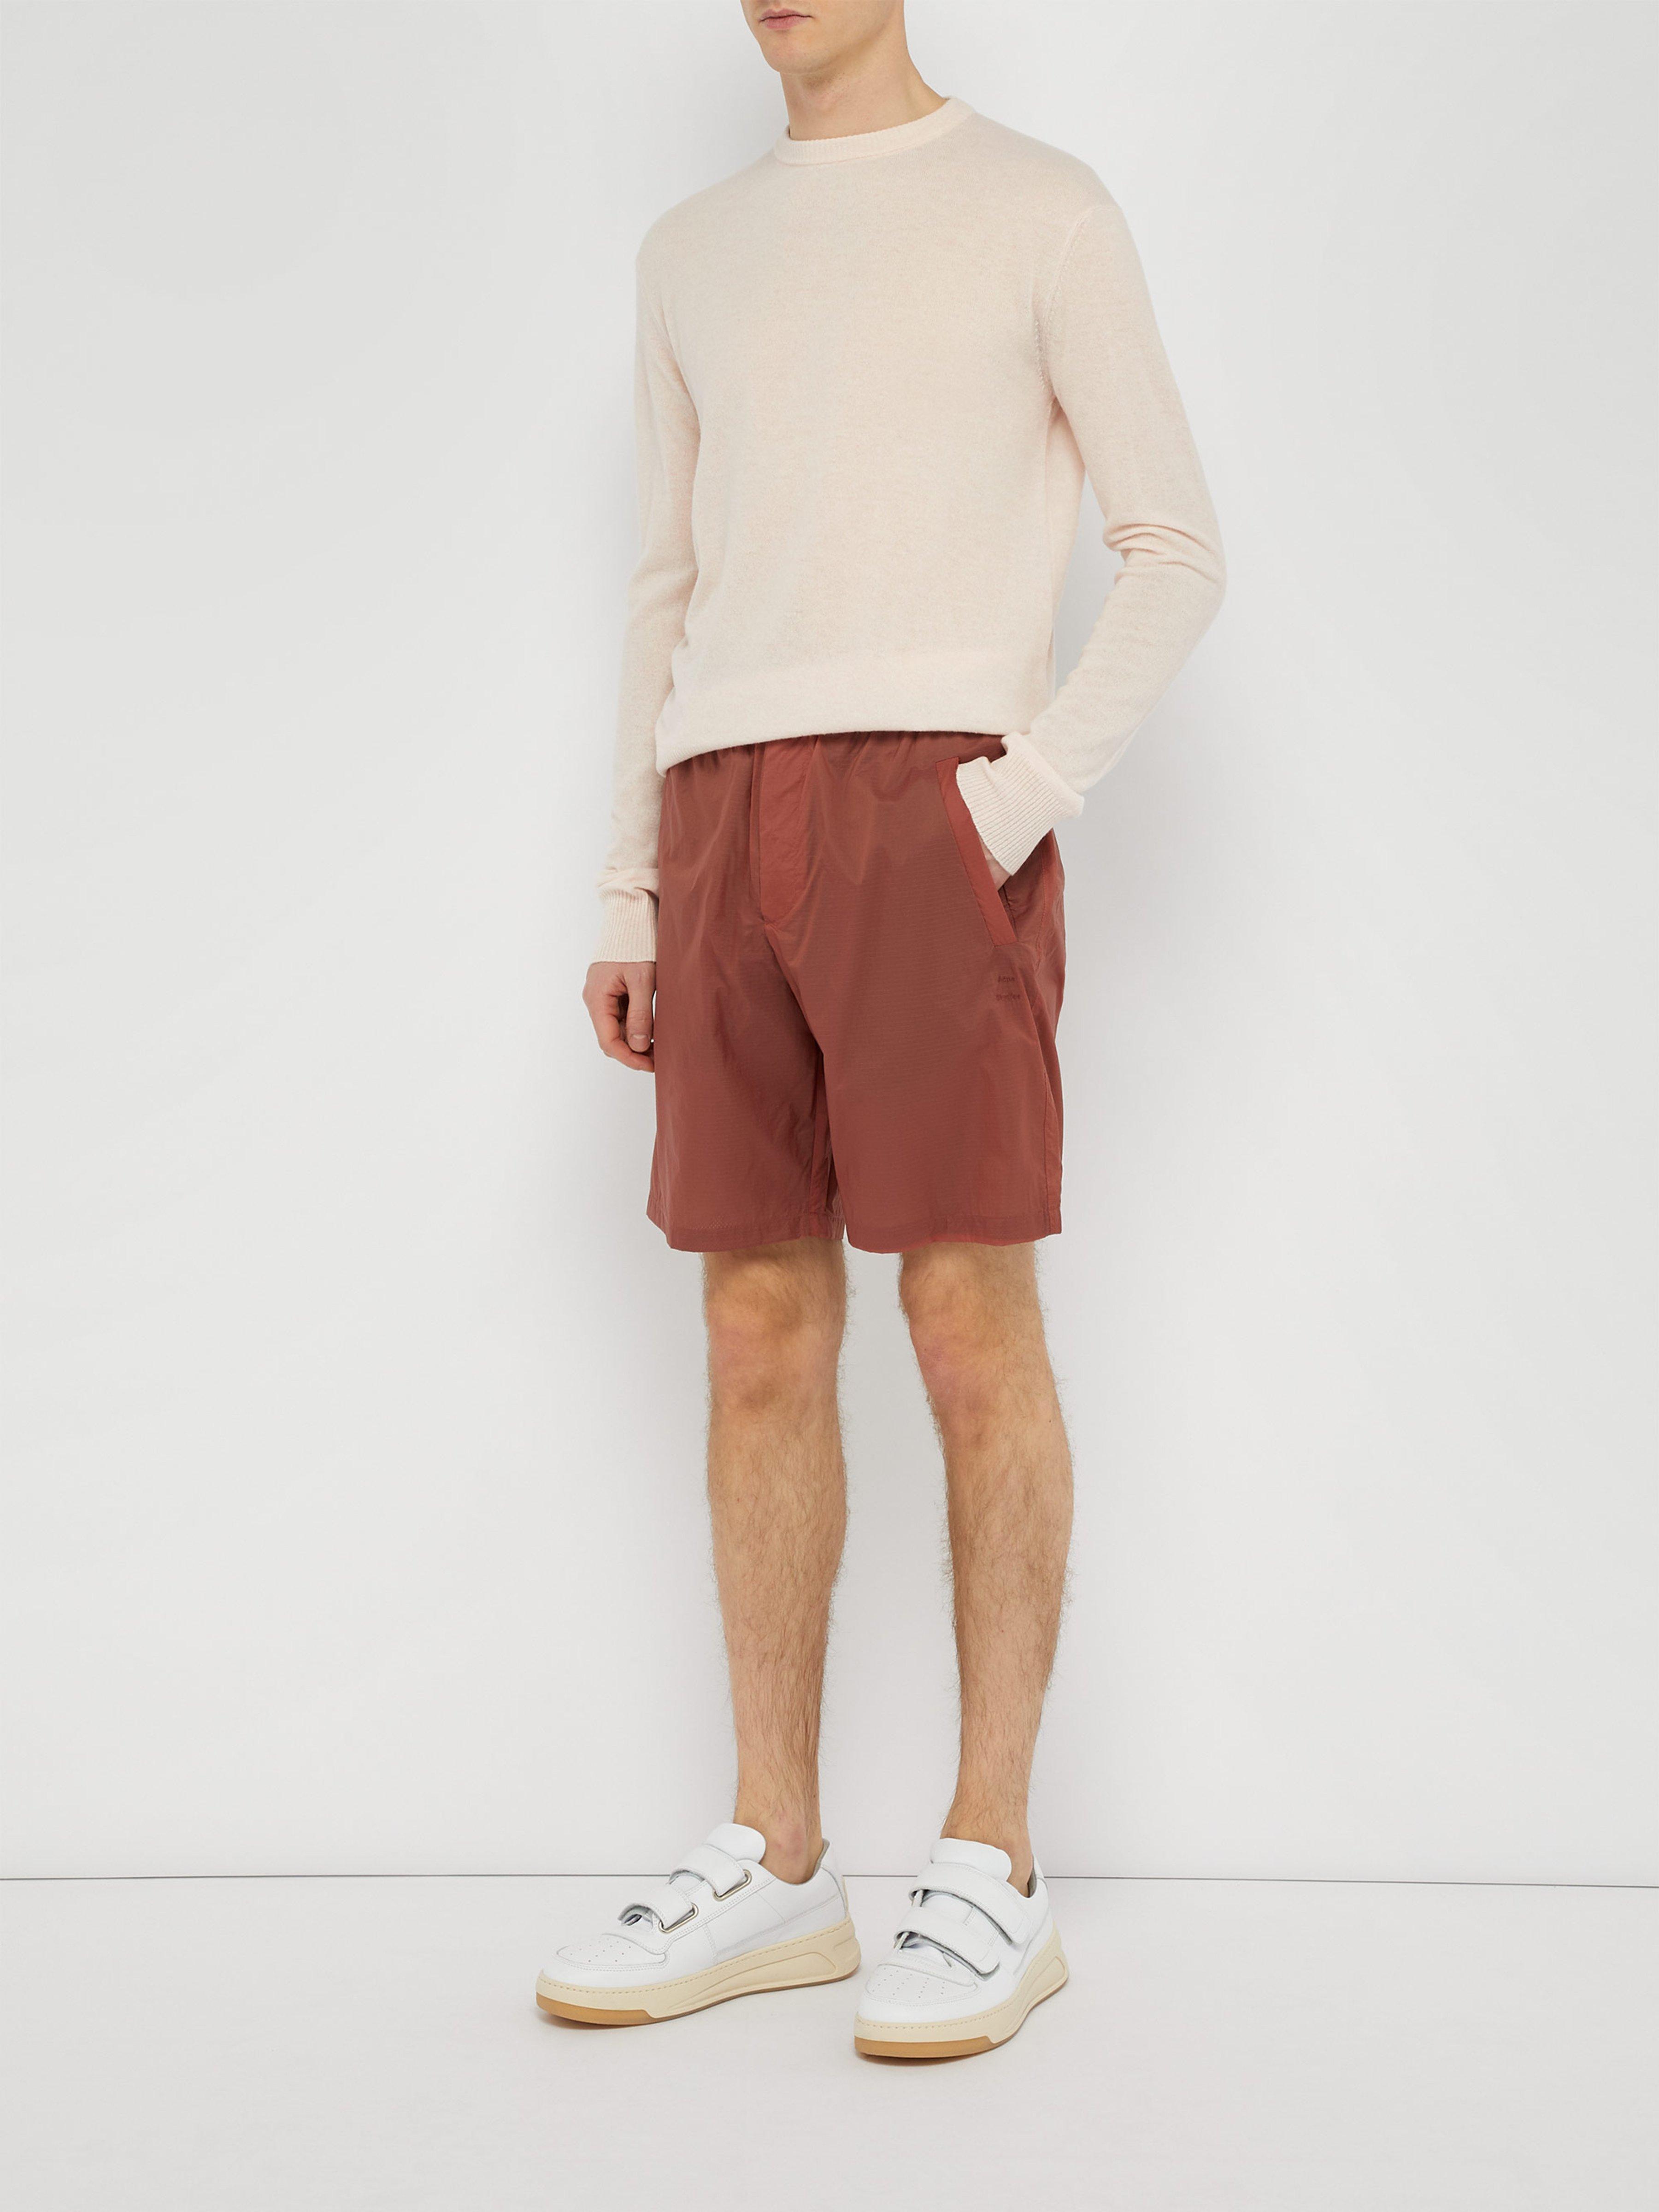 6b62e3b6f9 Acne Studios Ripstop Shorts in Orange for Men - Lyst